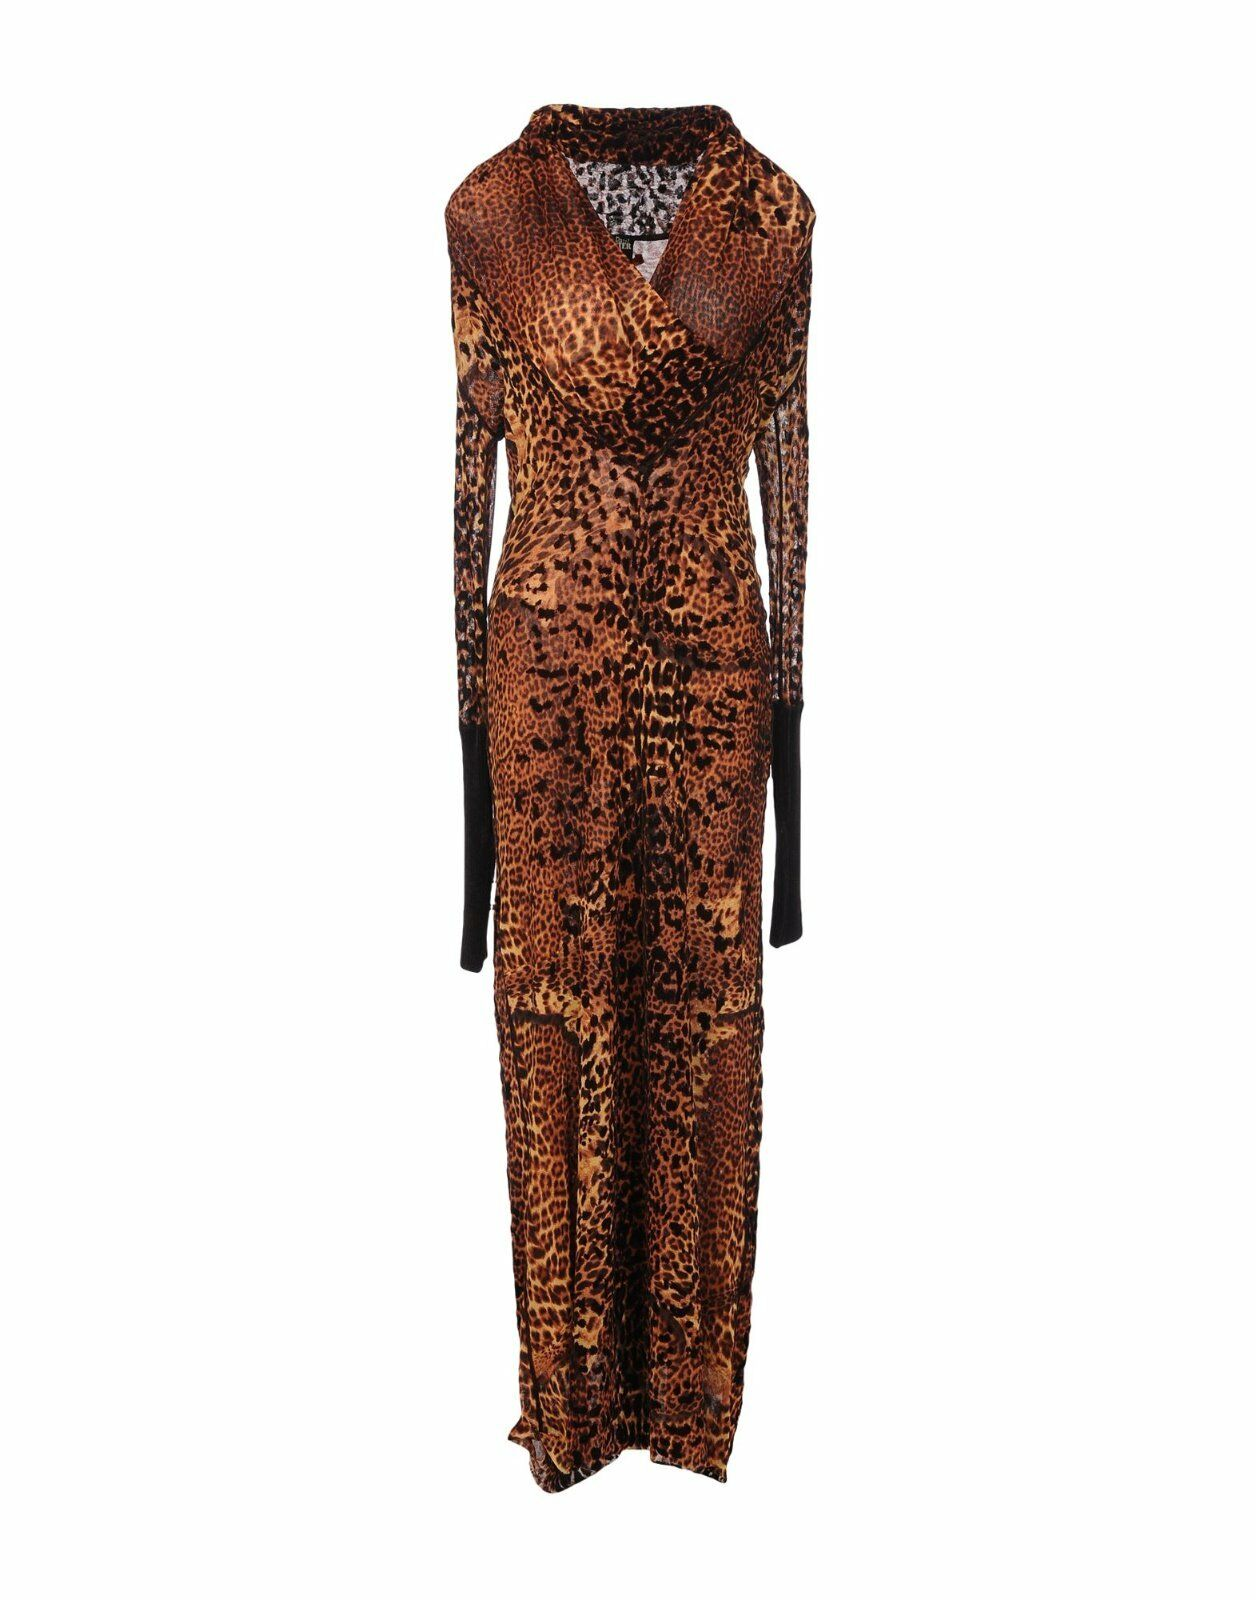 STUNNING, SOLD OUT, NWT ,295 JEAN PAUL GAULTIER LEOPARD PRINT MESH MAXI DRESS